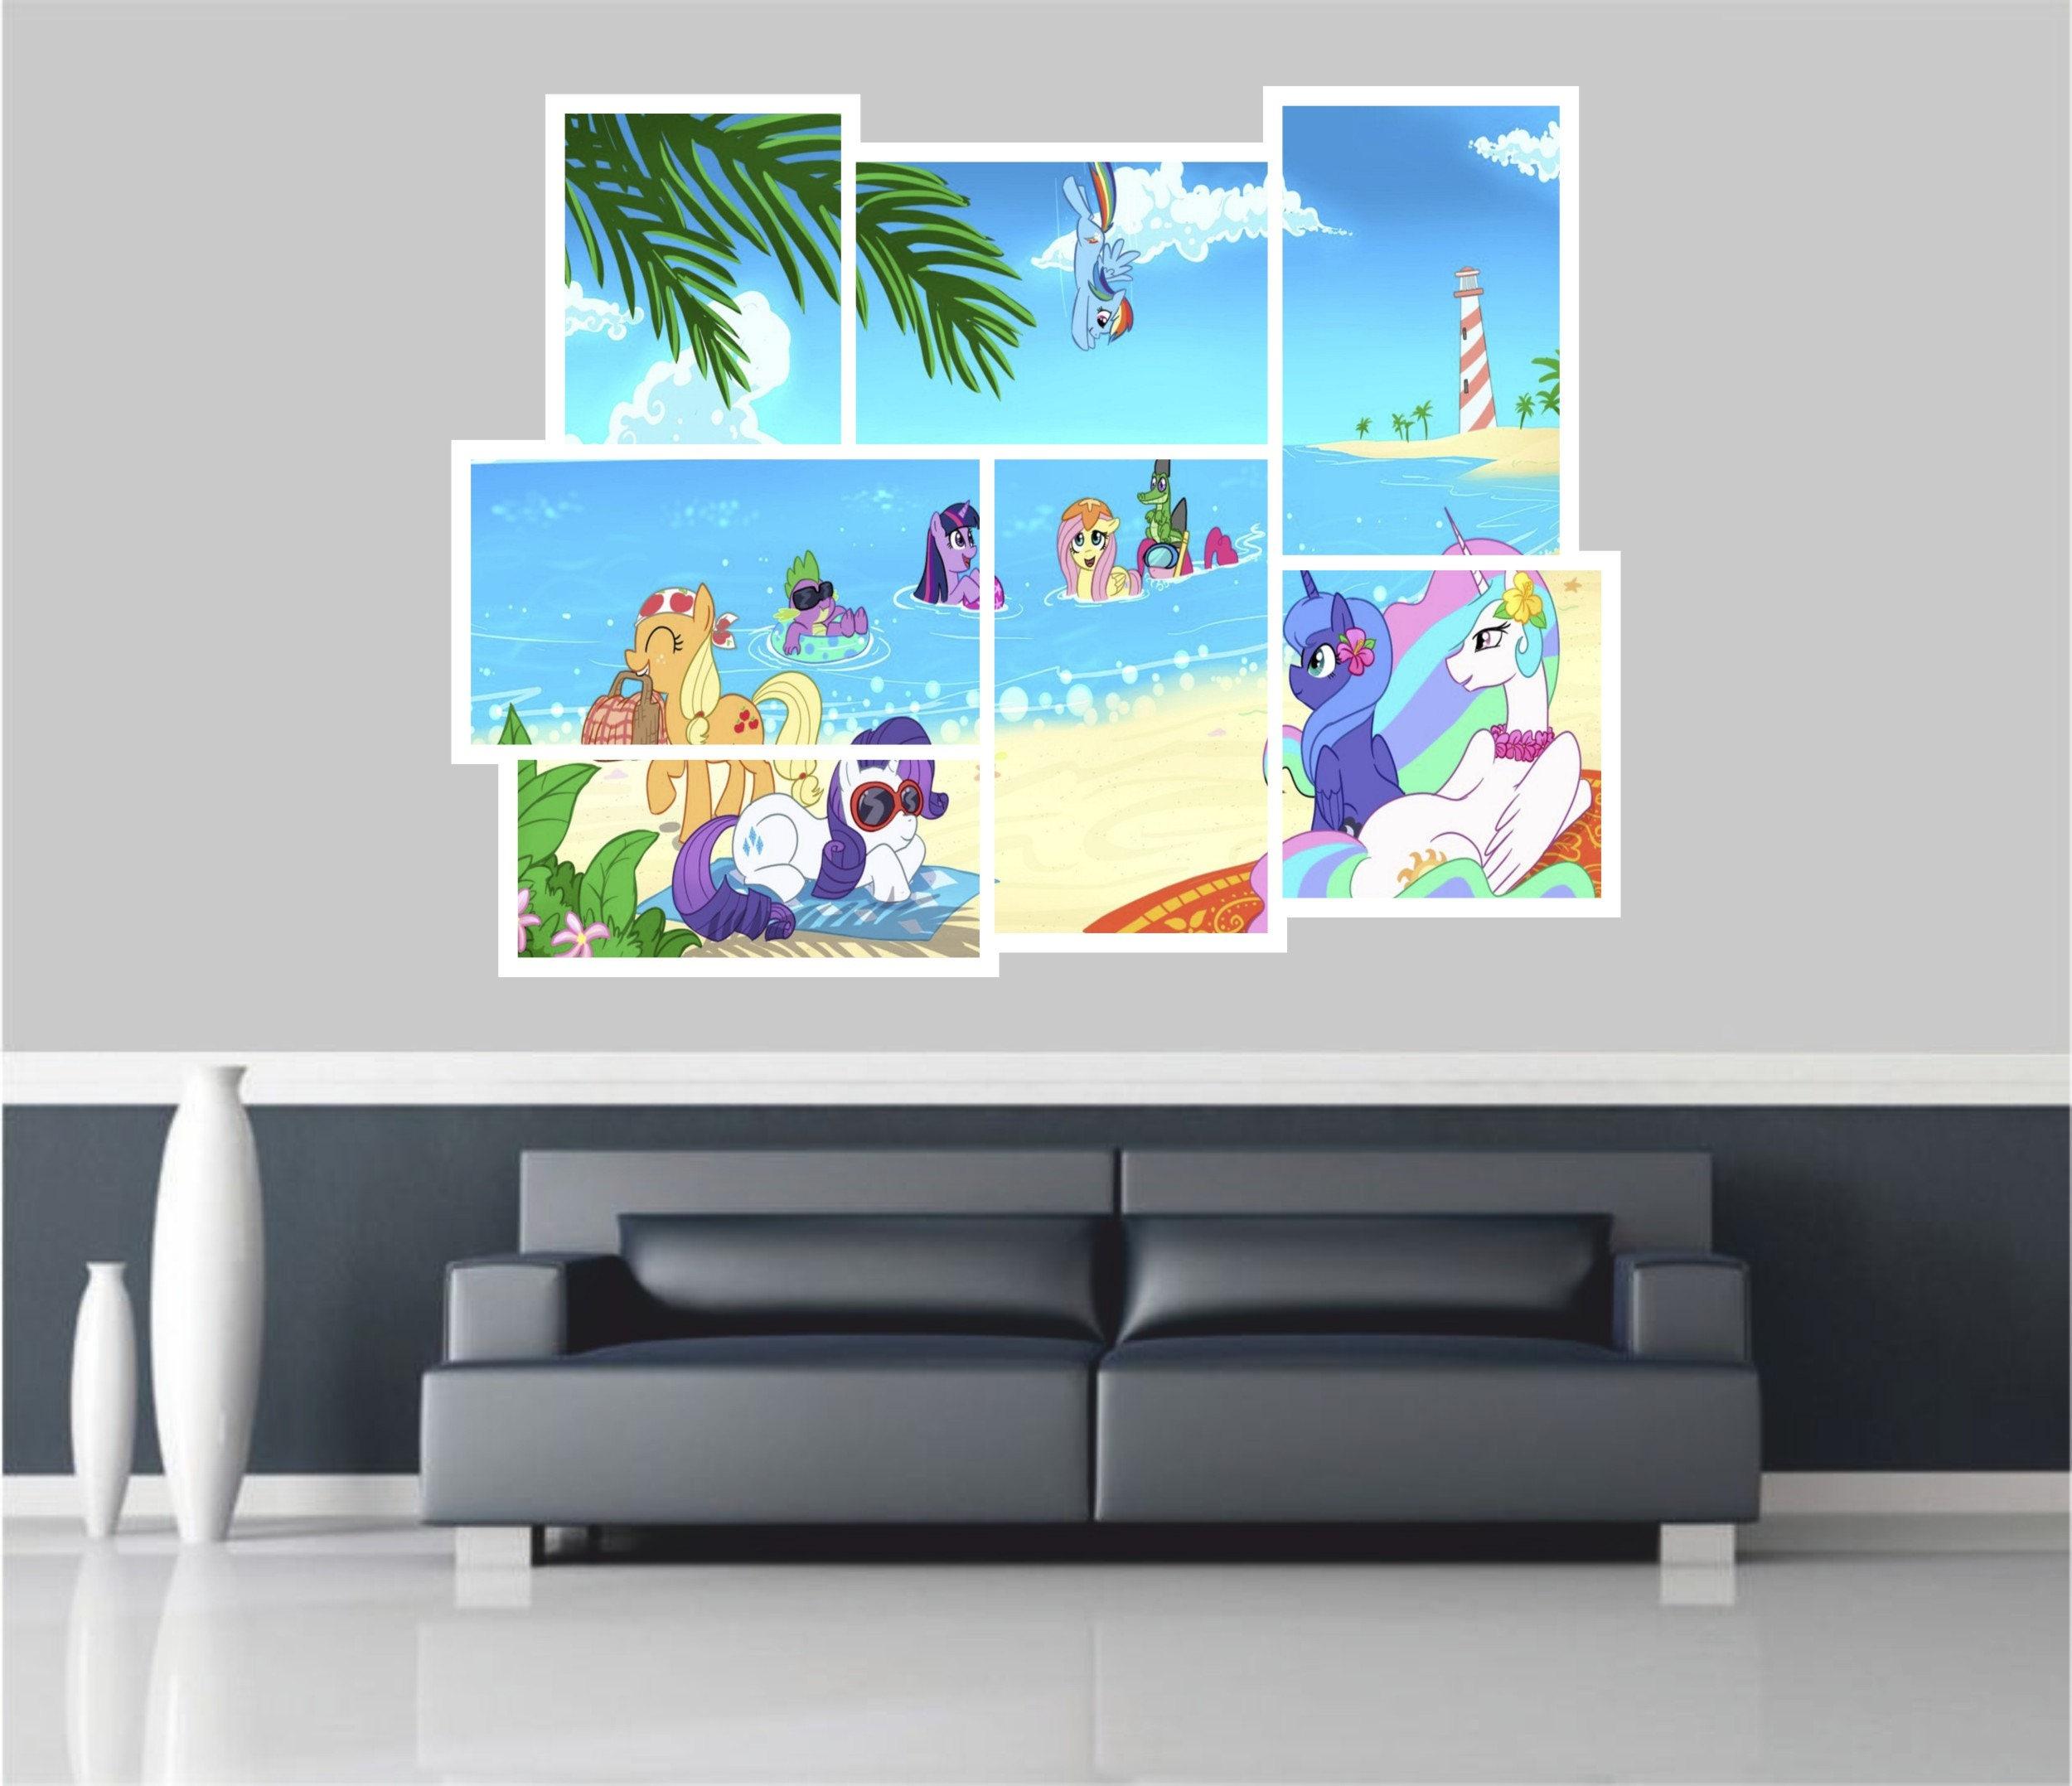 Huge 3D Balcony Mclaren P1 Super Car Wall Stickers Wallpaper Mural 803